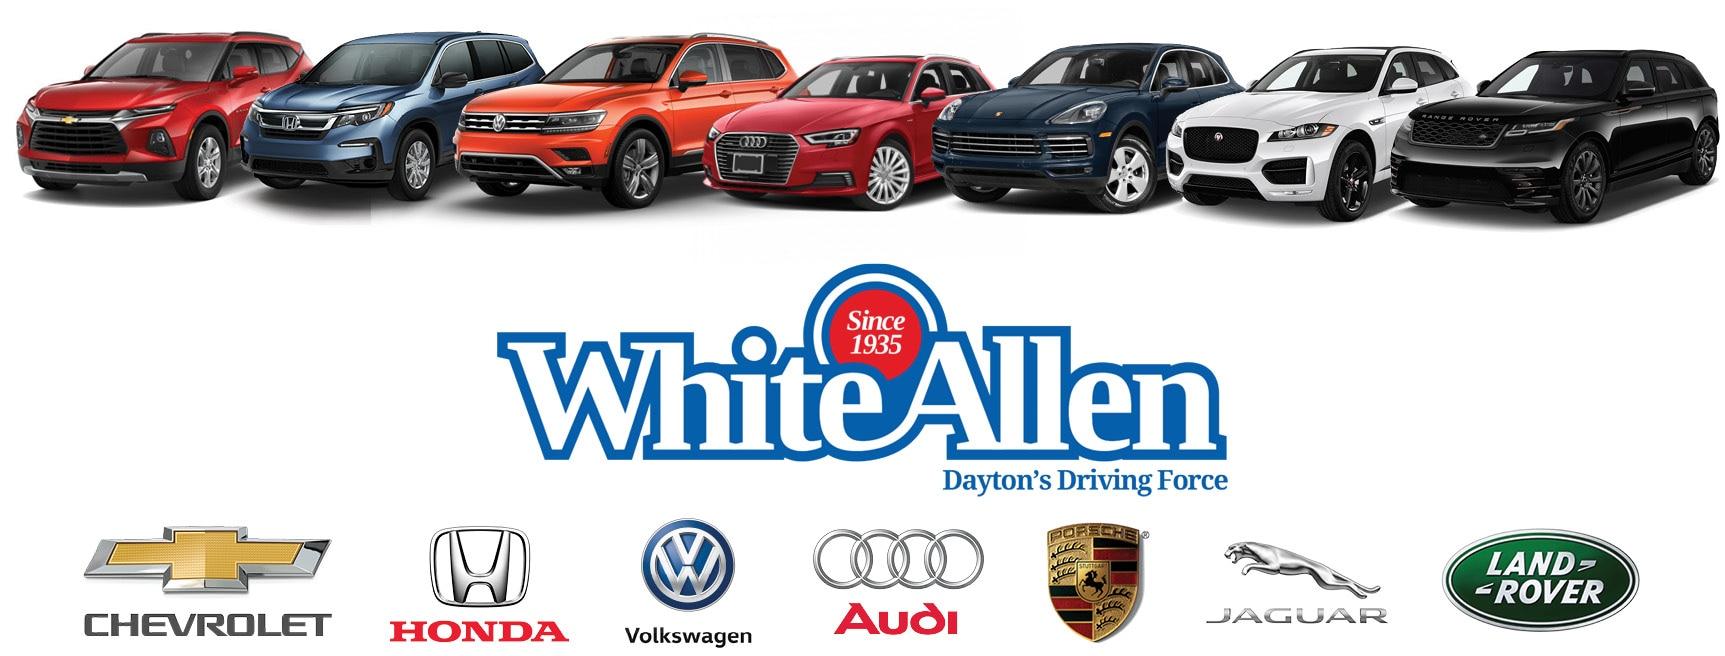 White Allen Family Companies New Volkswagen Audi